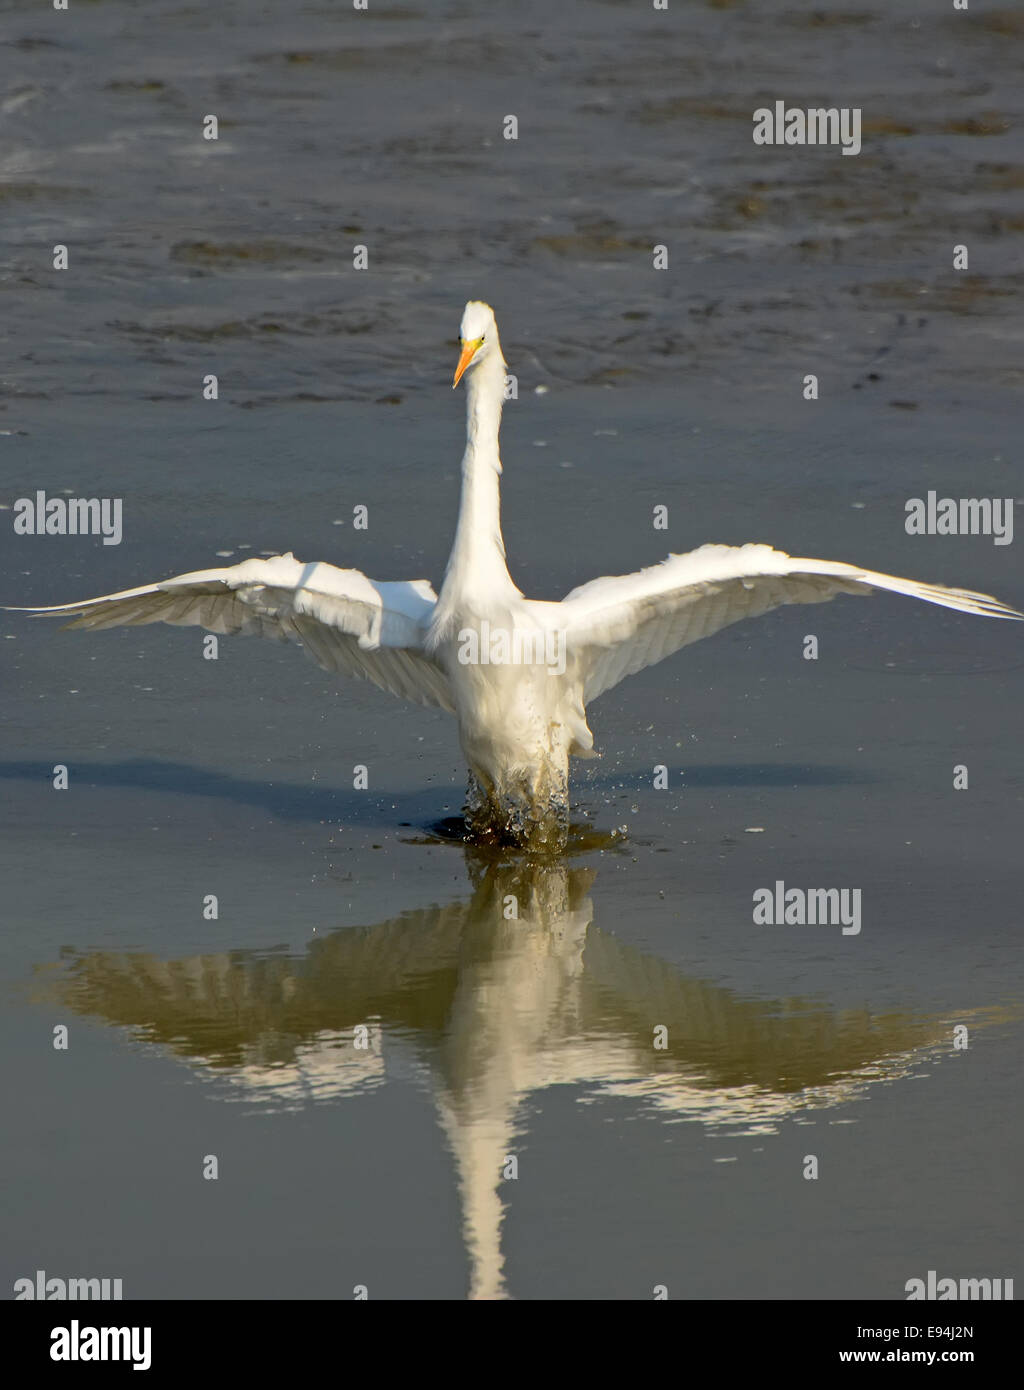 Great Egret, Ardea alba - Stock Image